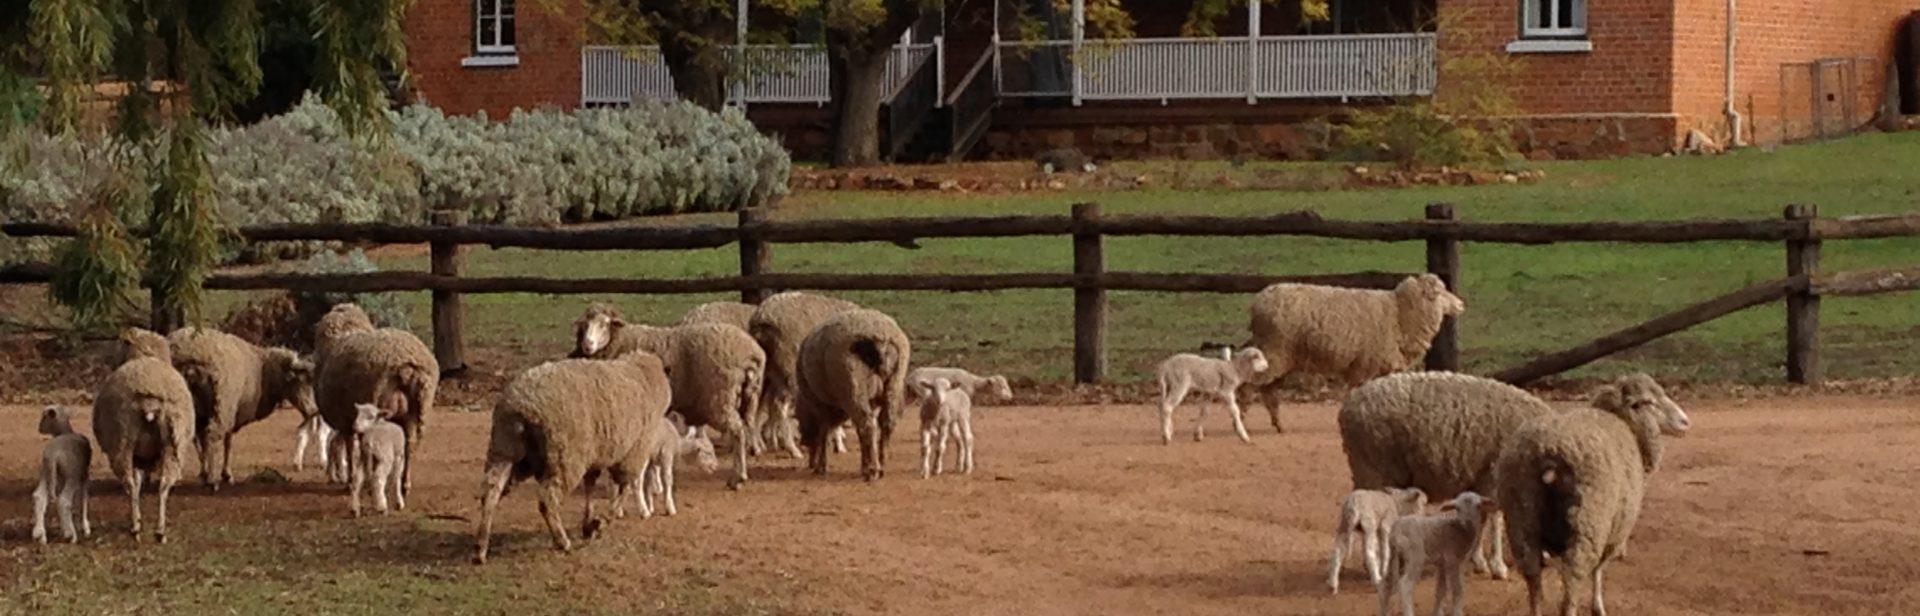 Avondale Farm